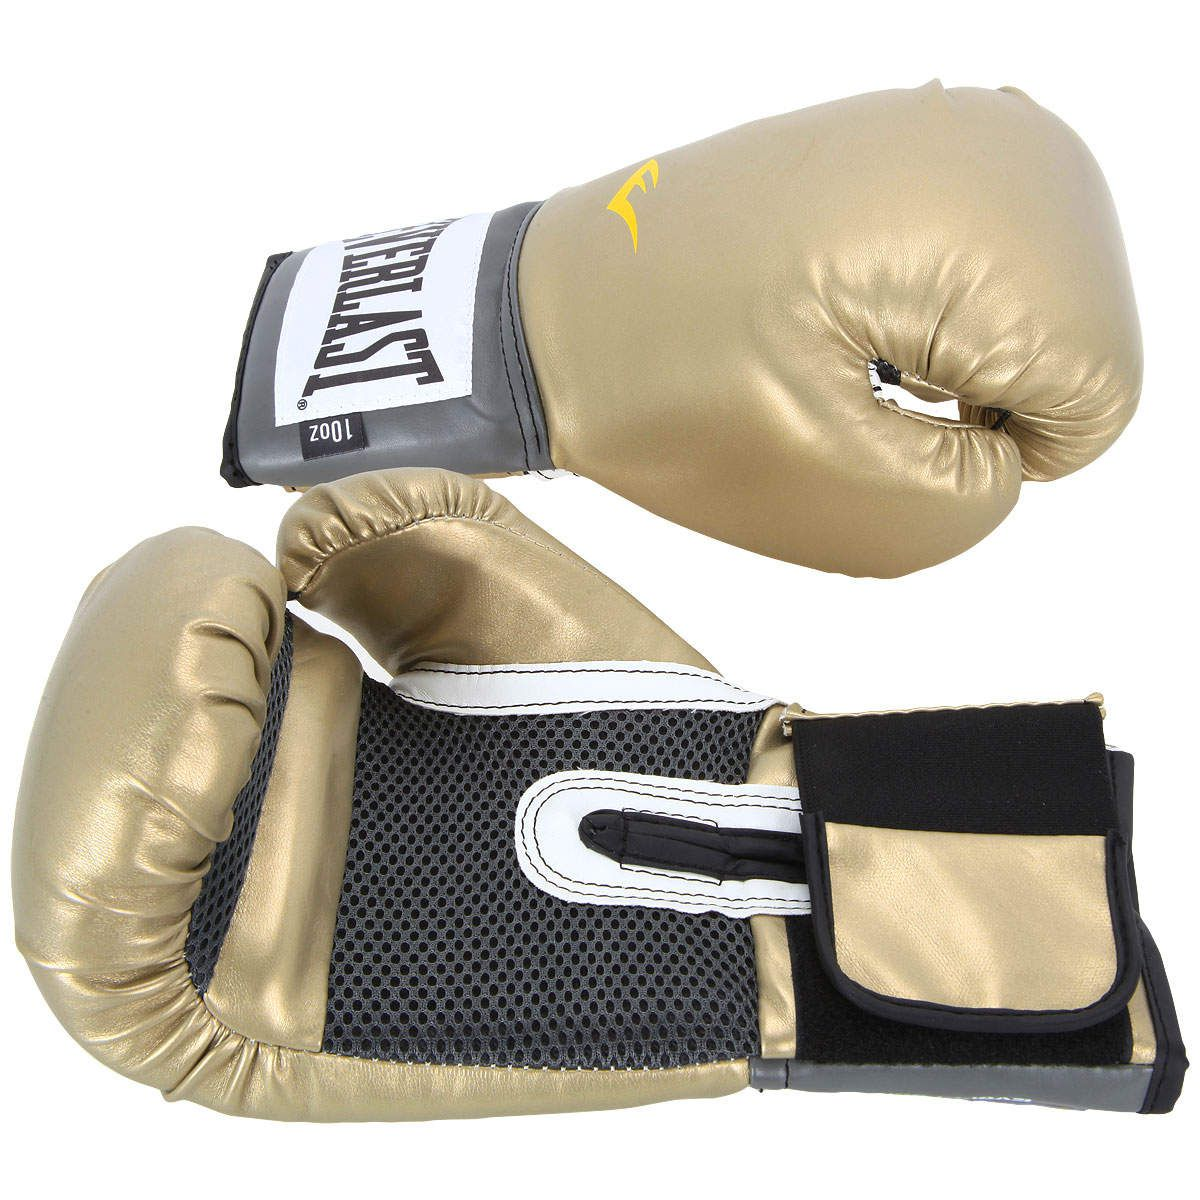 Luvas Boxe / Muay Thai - Elite  Evershield - Dourado - Everlast .  - Loja do Competidor